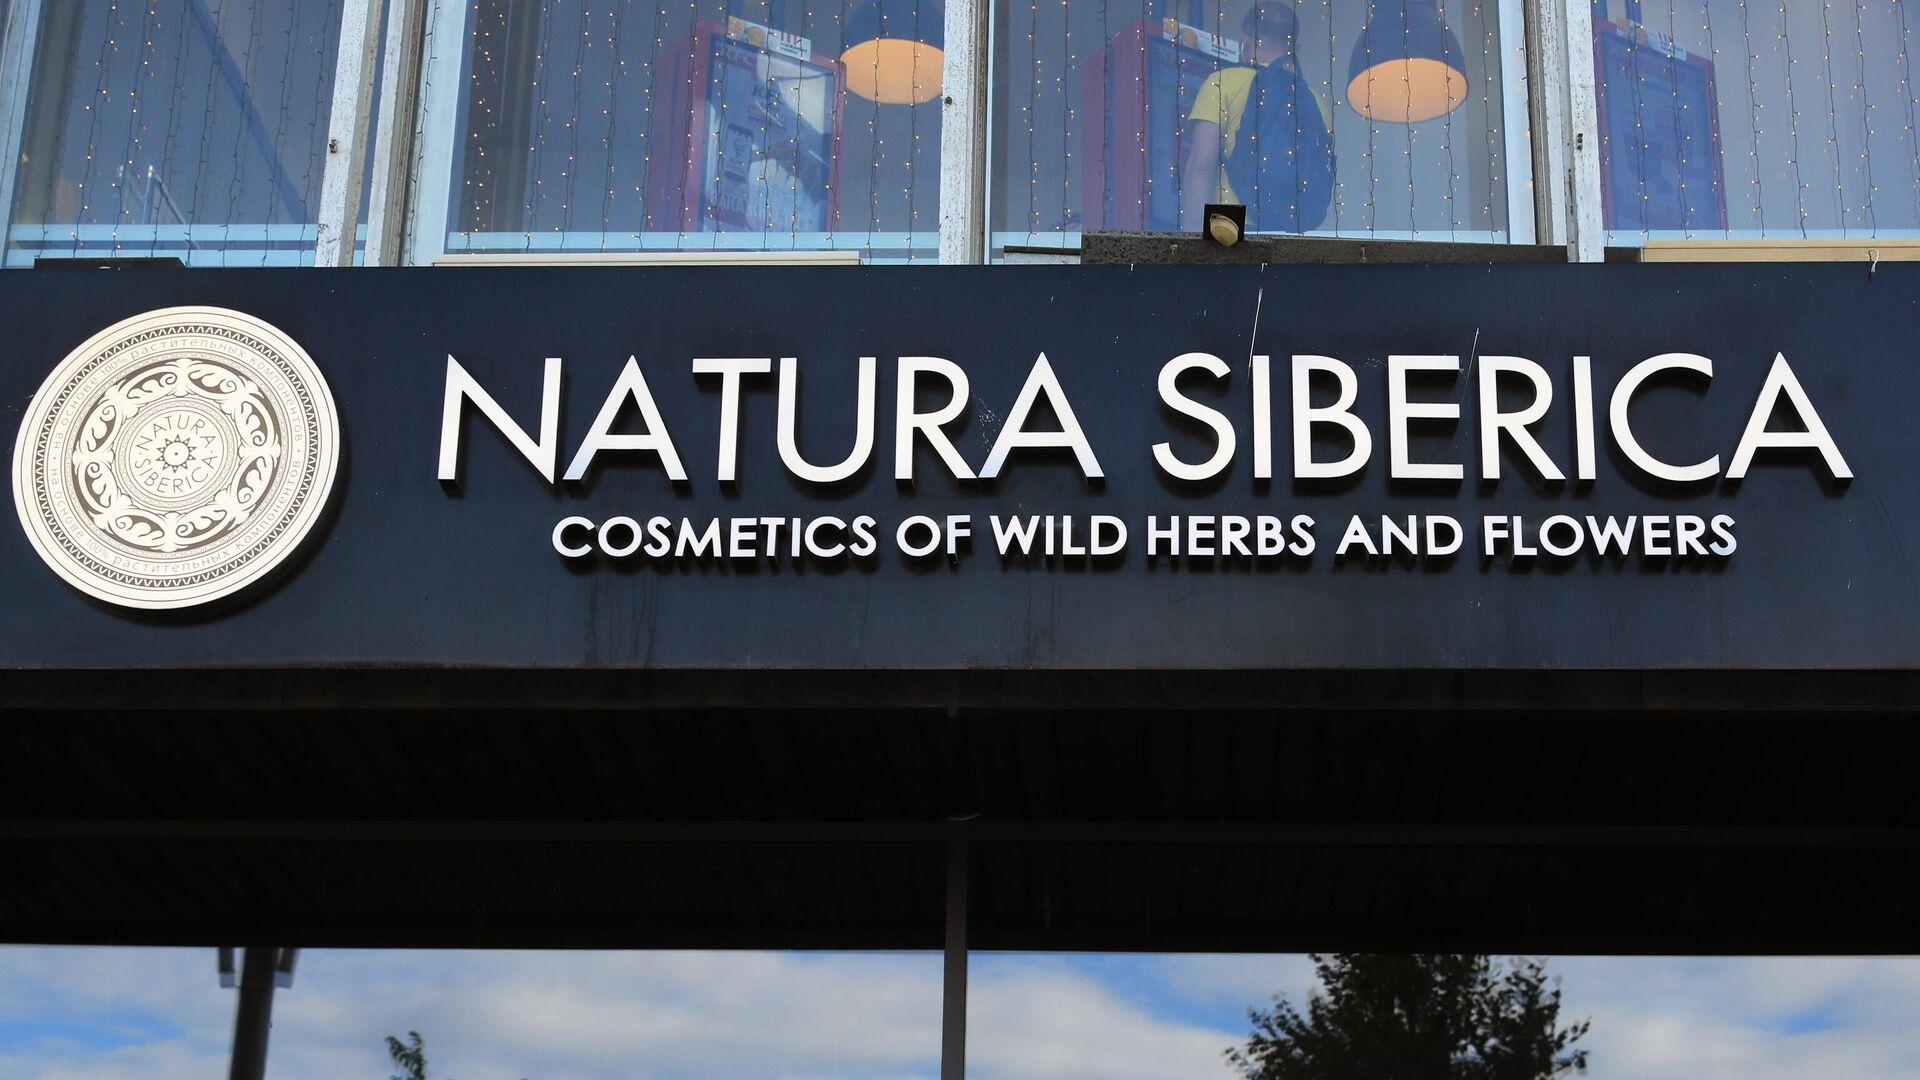 Суд назначил управляющего активами основателя Natura Siberica